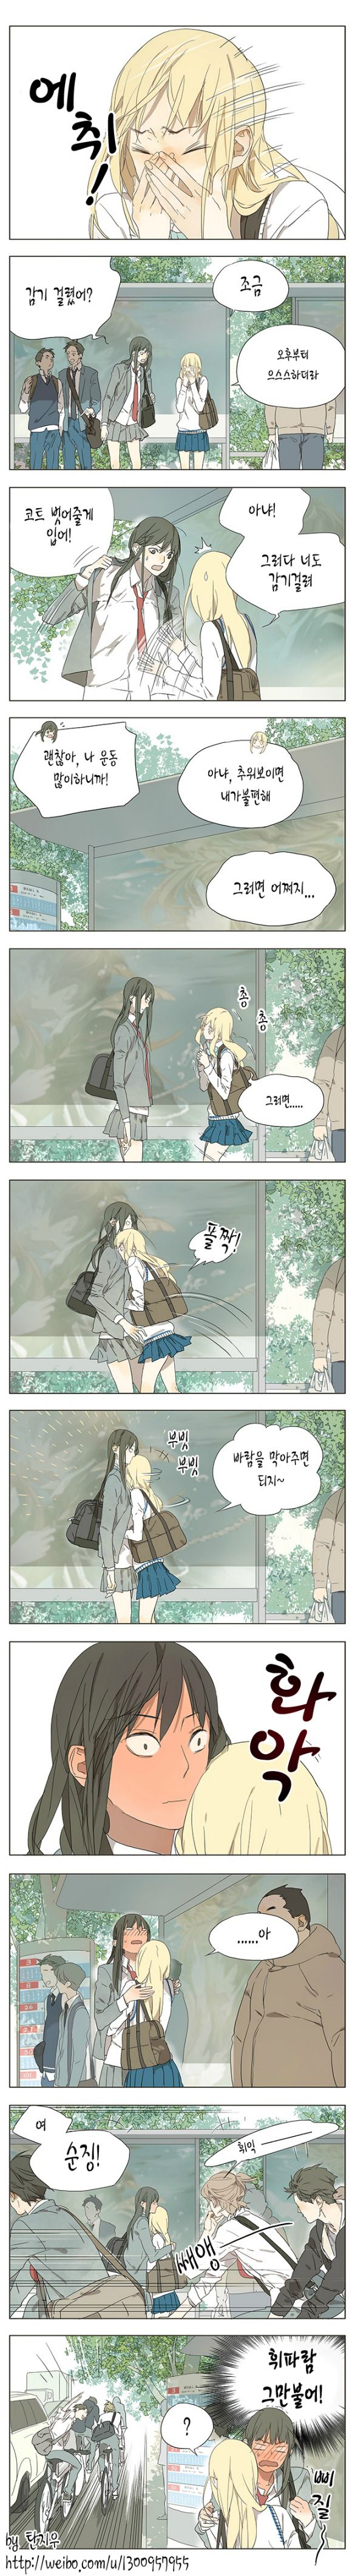 New TOWA Generation : [번역]탄지우 - 그들의 이야기 (원제:SQ) 54화 ~ 55화